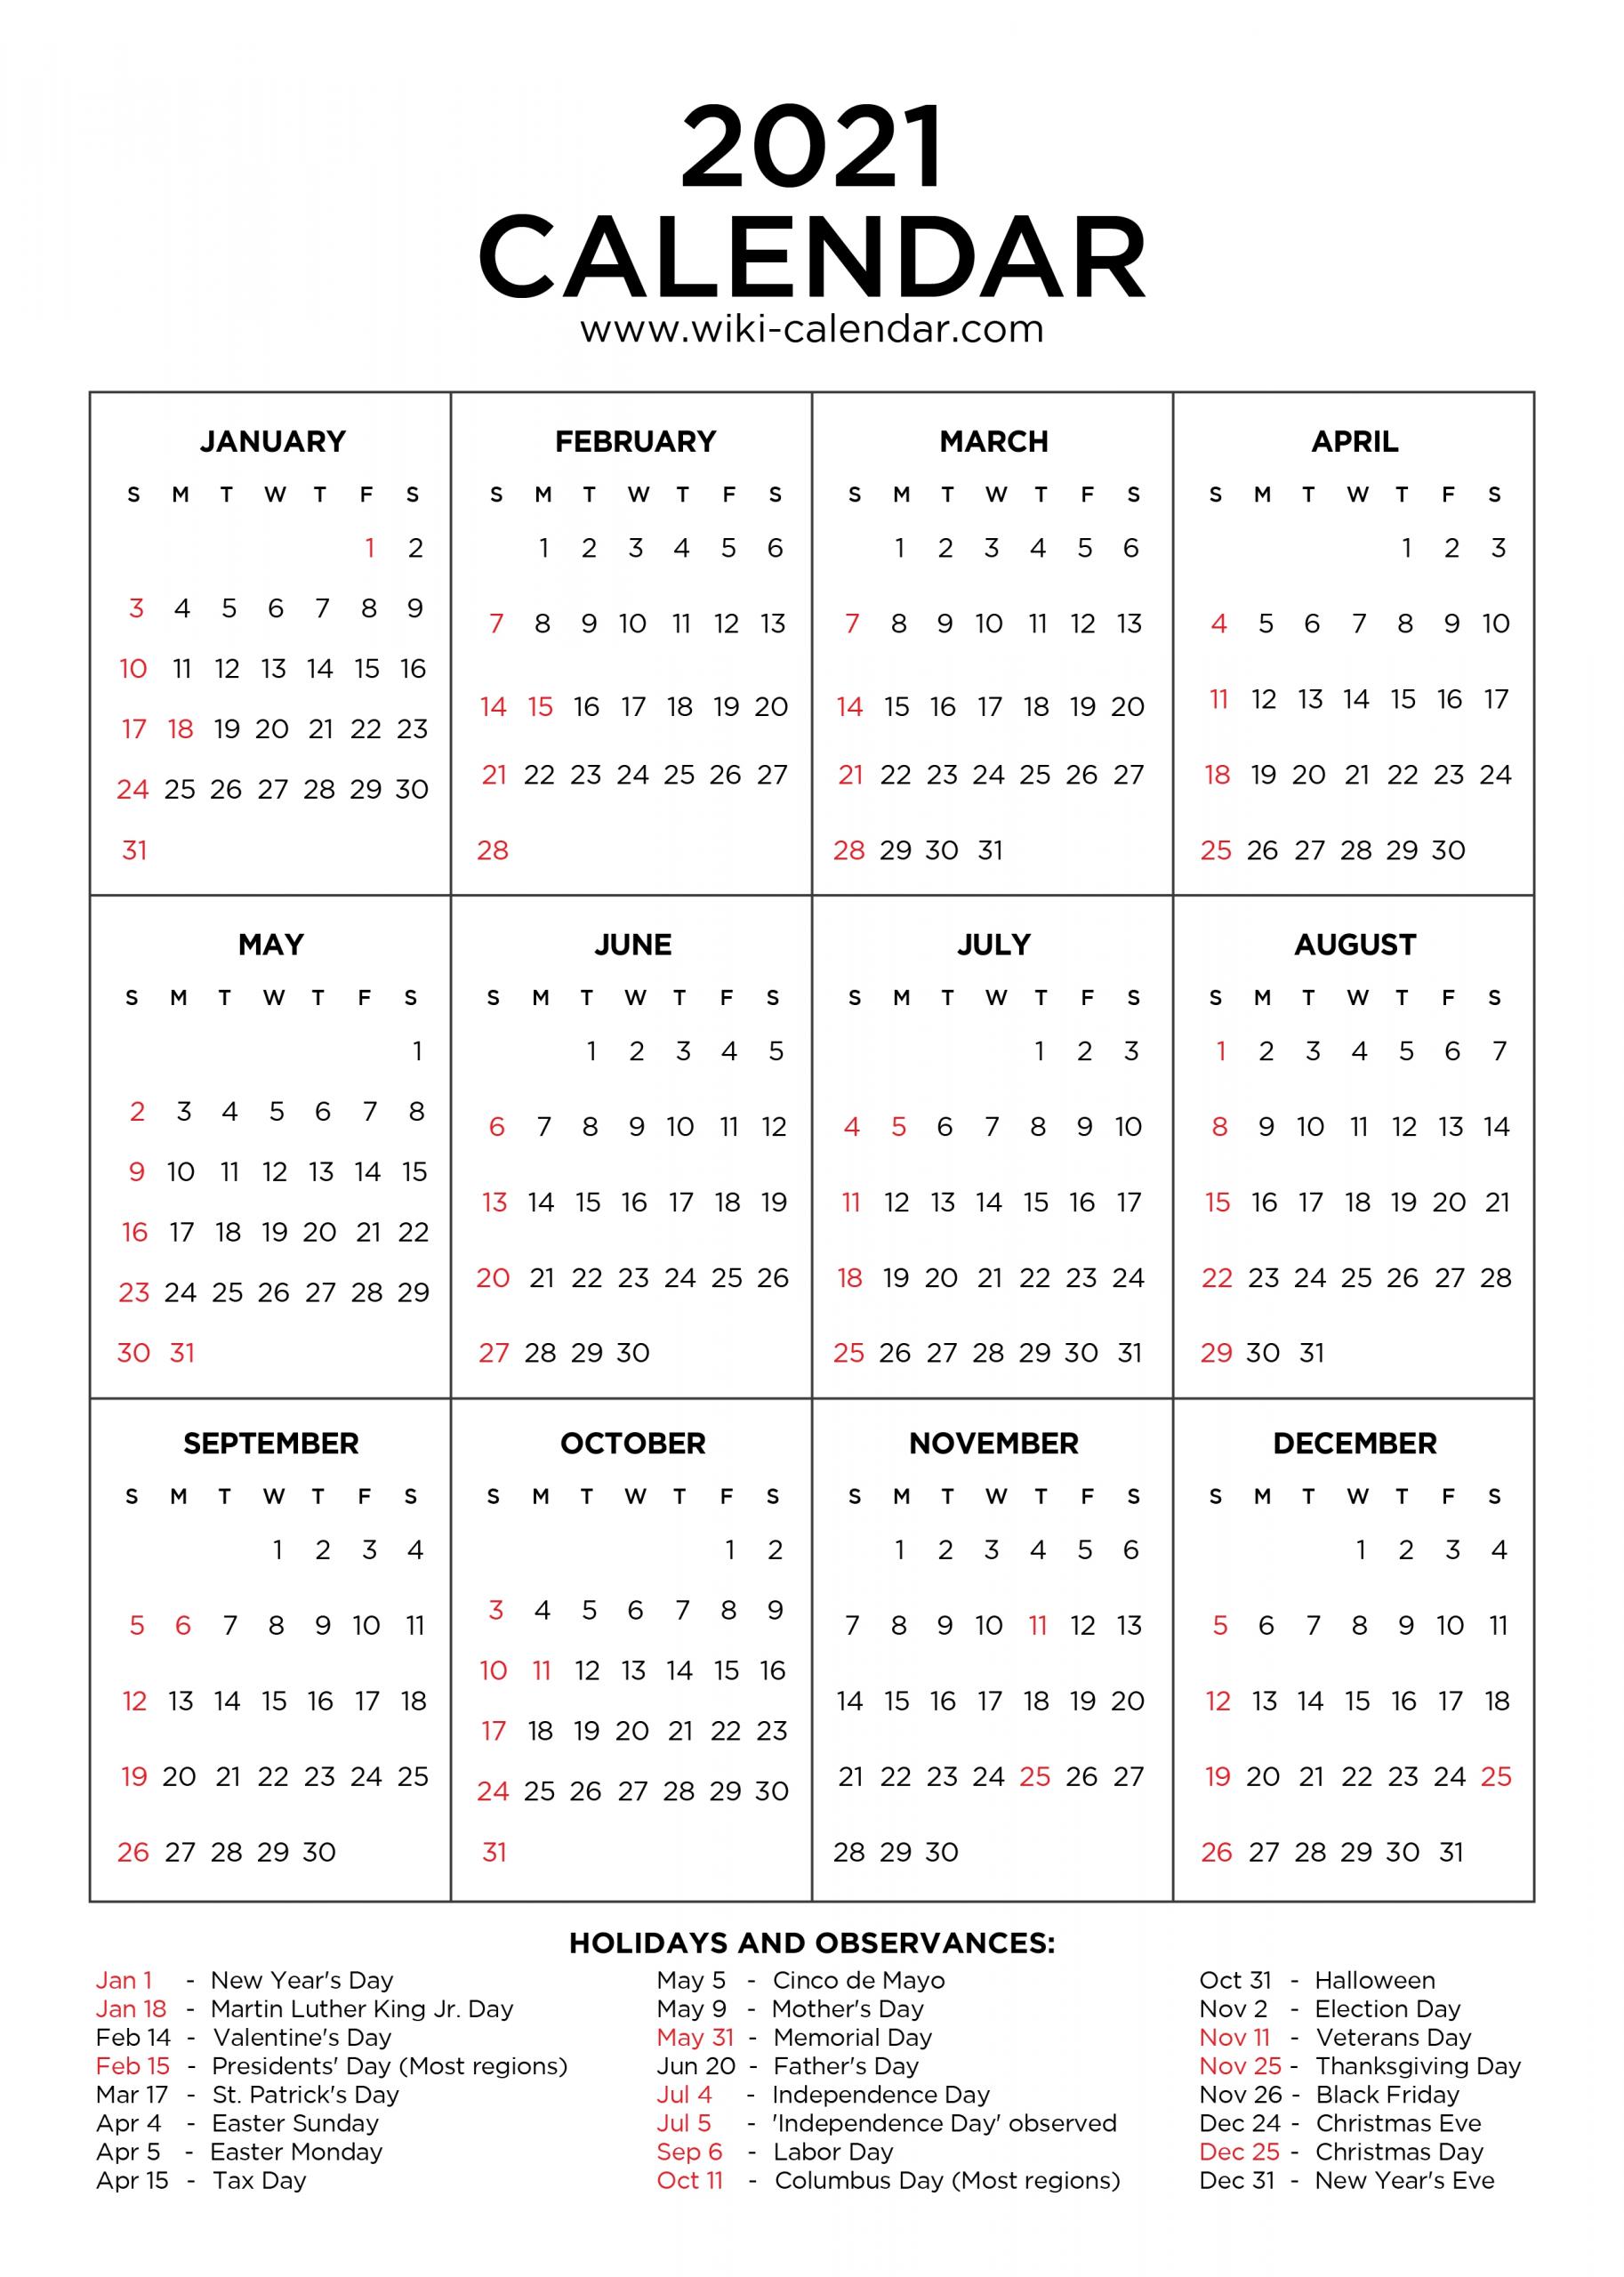 2021 Calendar With Holidays Printable | Calendar Template With 2021 Calendar With Federal Printabl